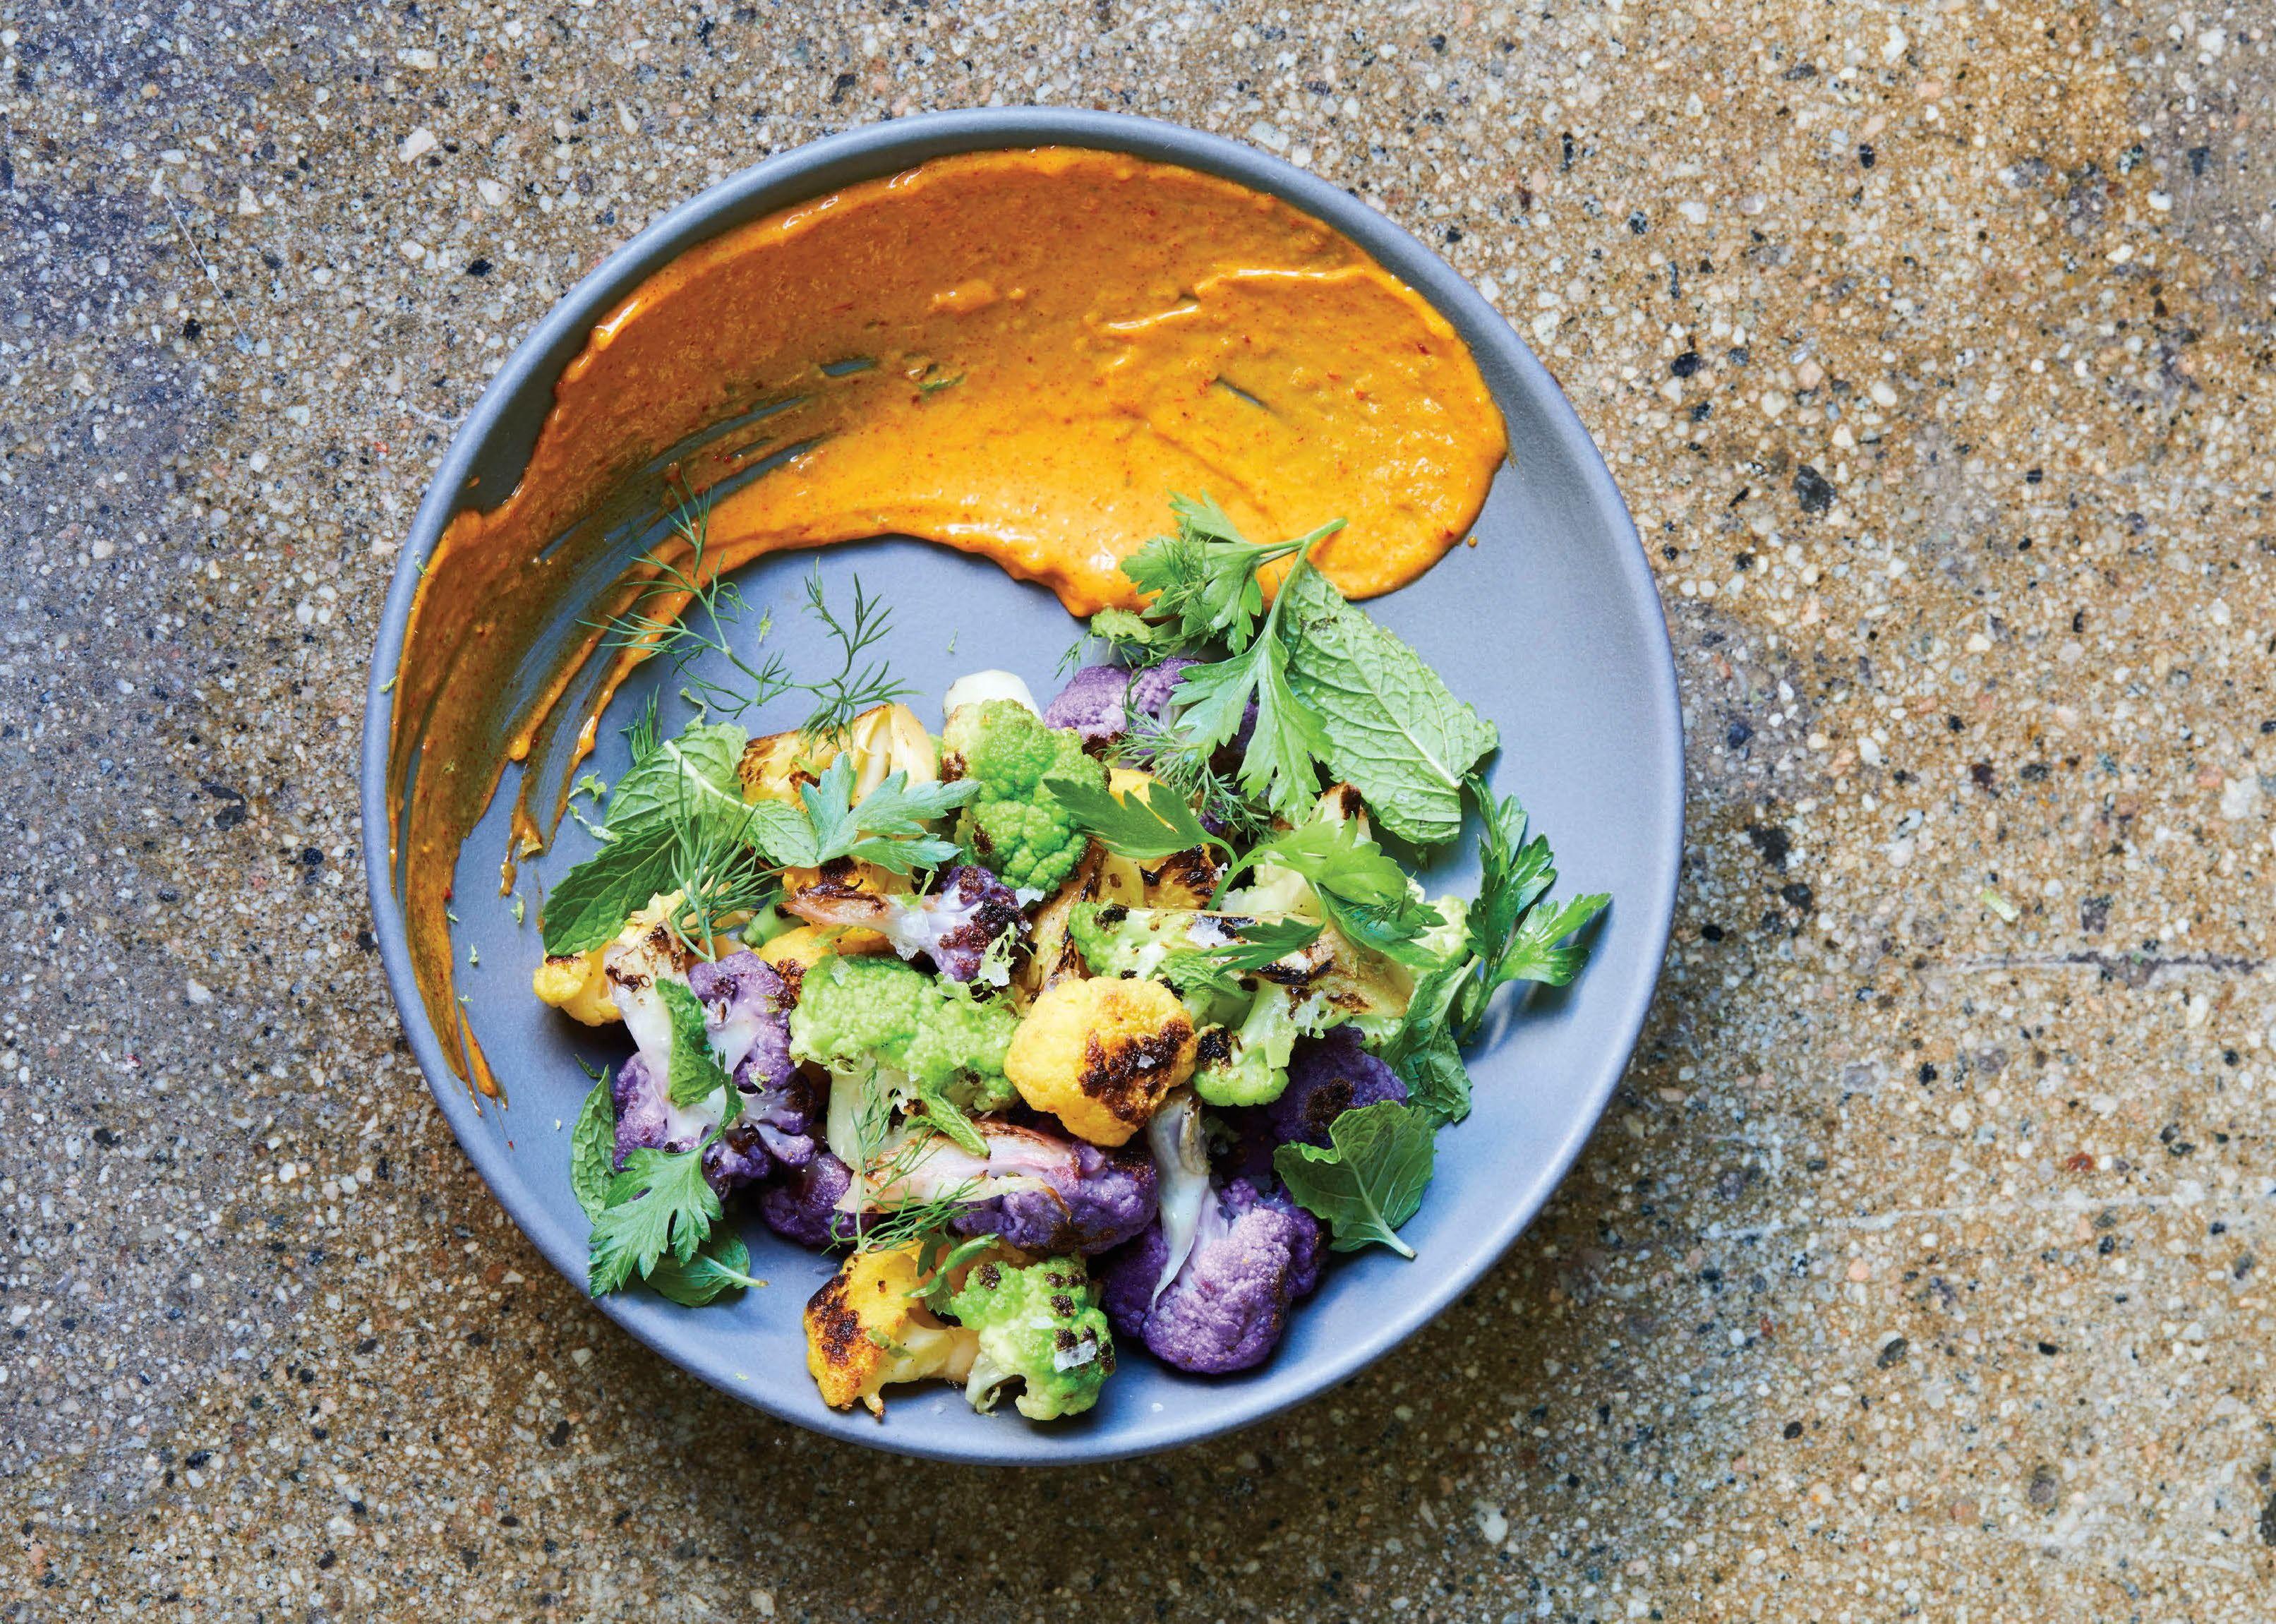 Bestia's Roasted Cauliflower With Paprika Aioli And Soft Herbs